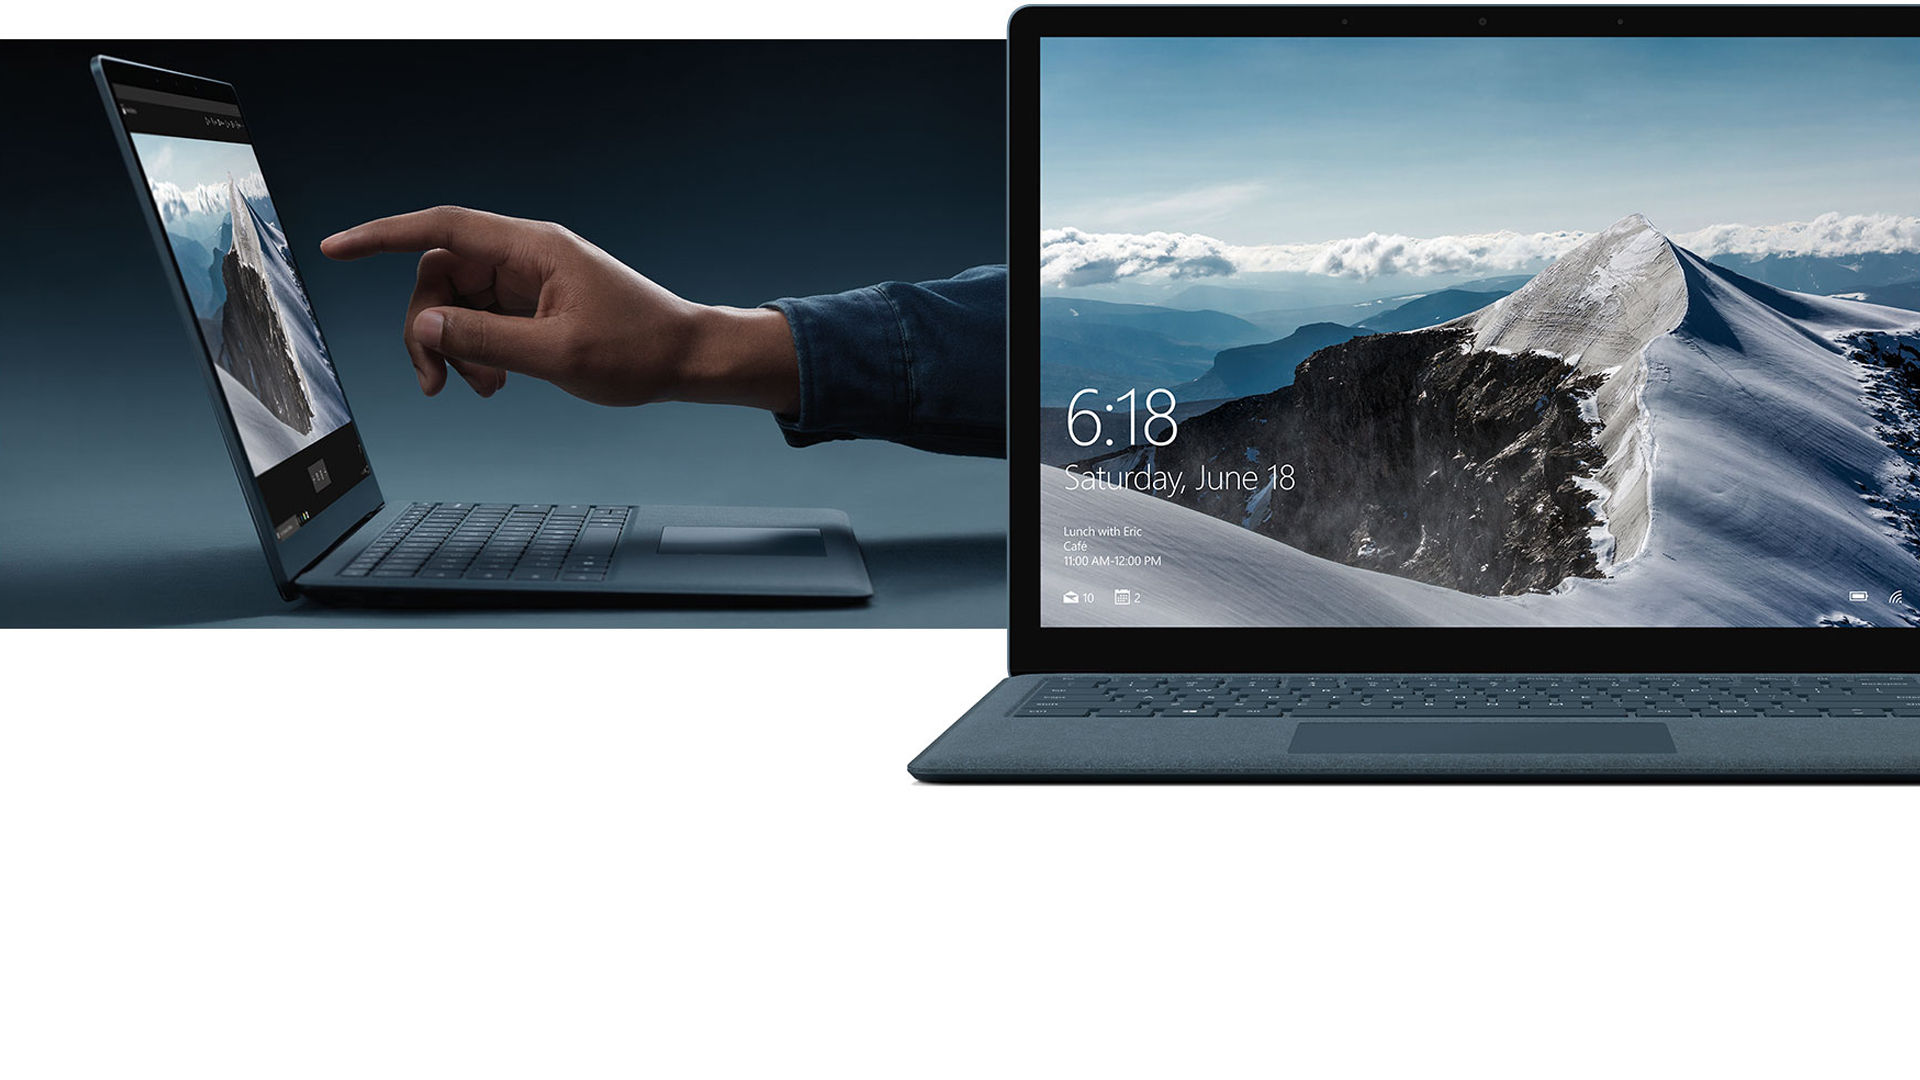 Frau bei der Arbeit an einem Surface Laptop-Touchscreen.